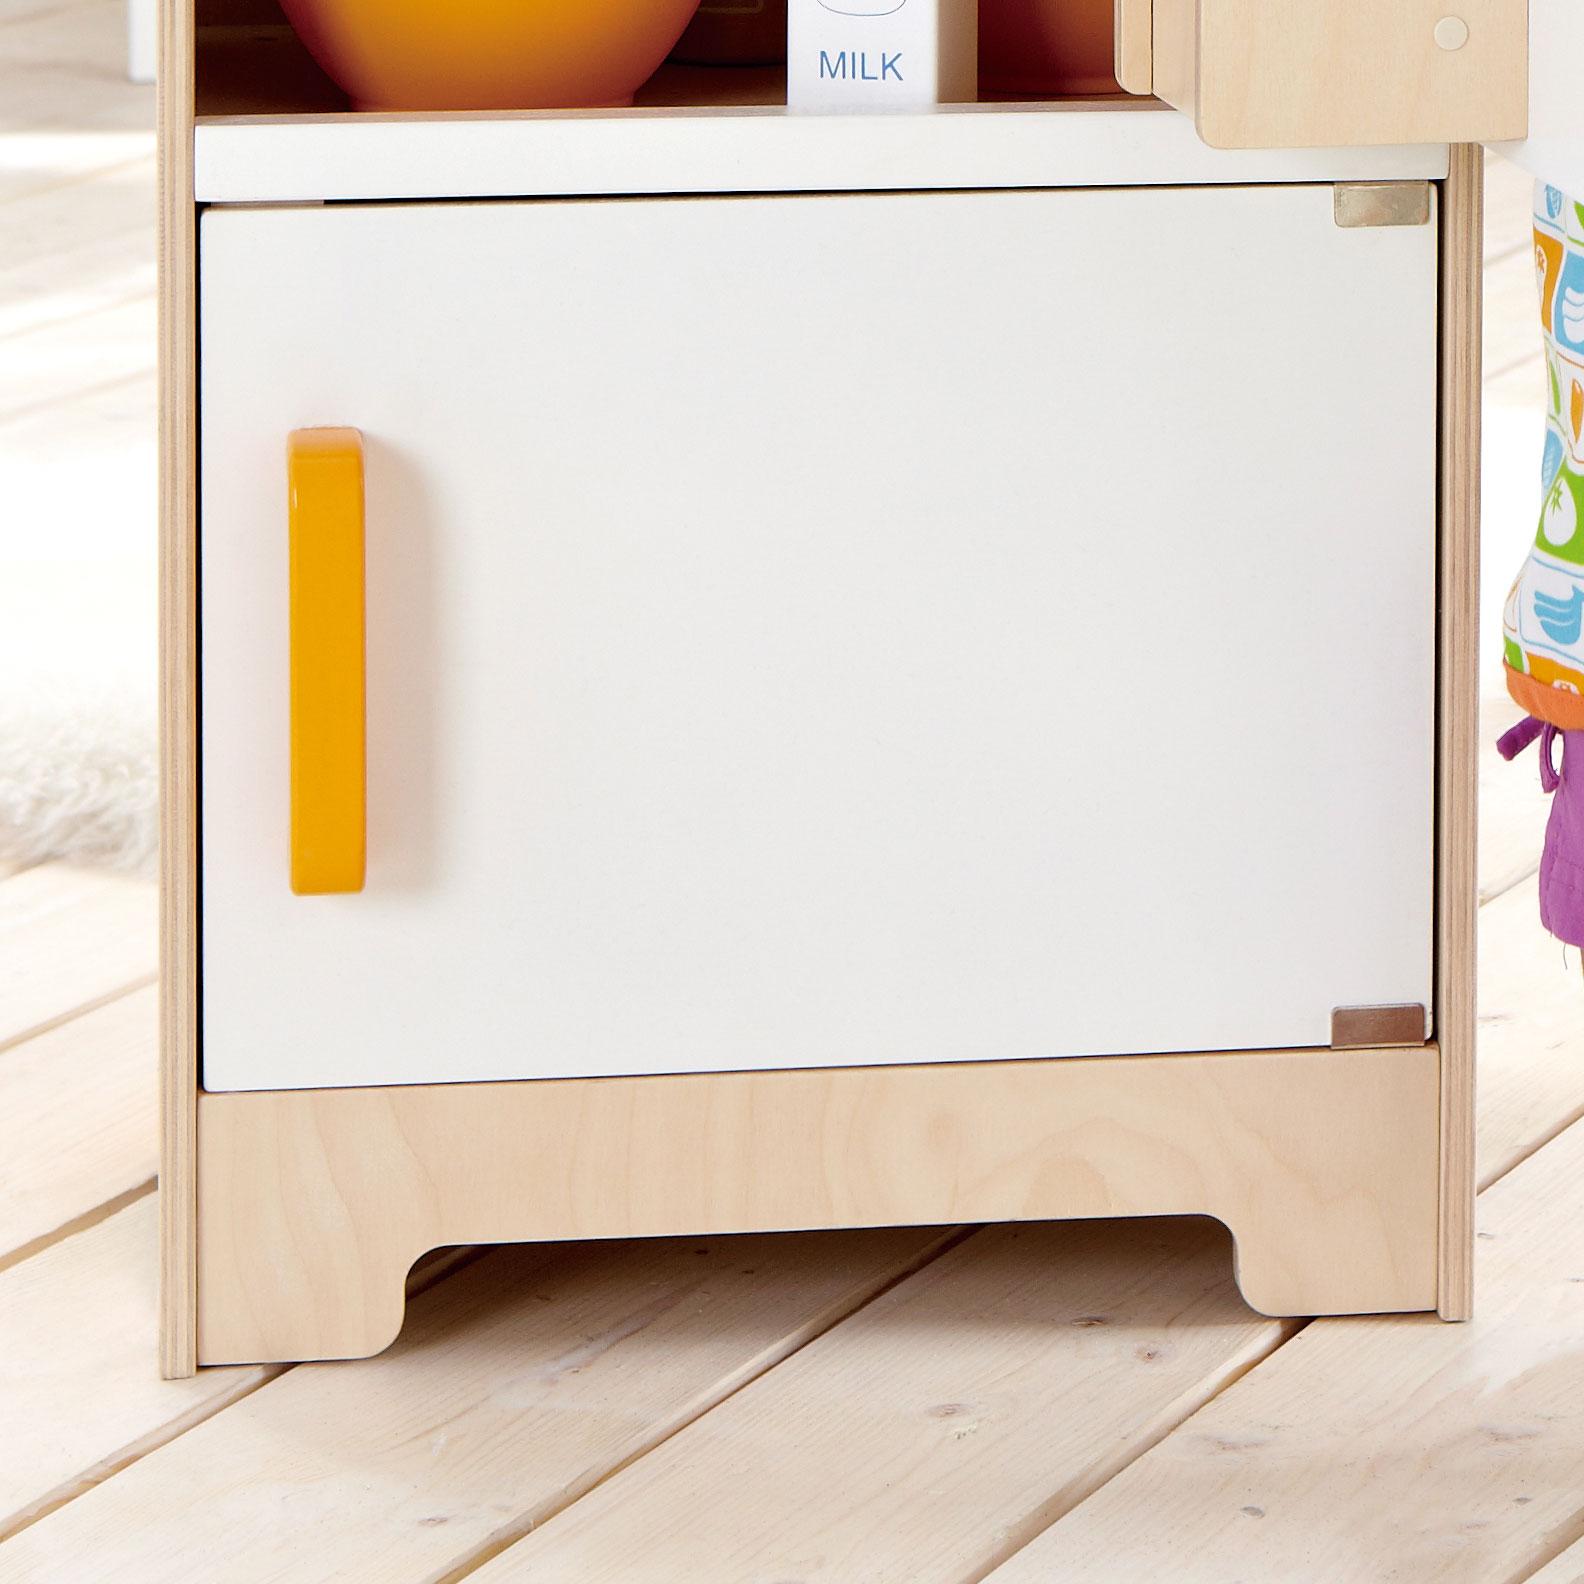 Hape Gourmet Wooden Kitchen Toddler & Kids Play Pretend Toy Fridge ...